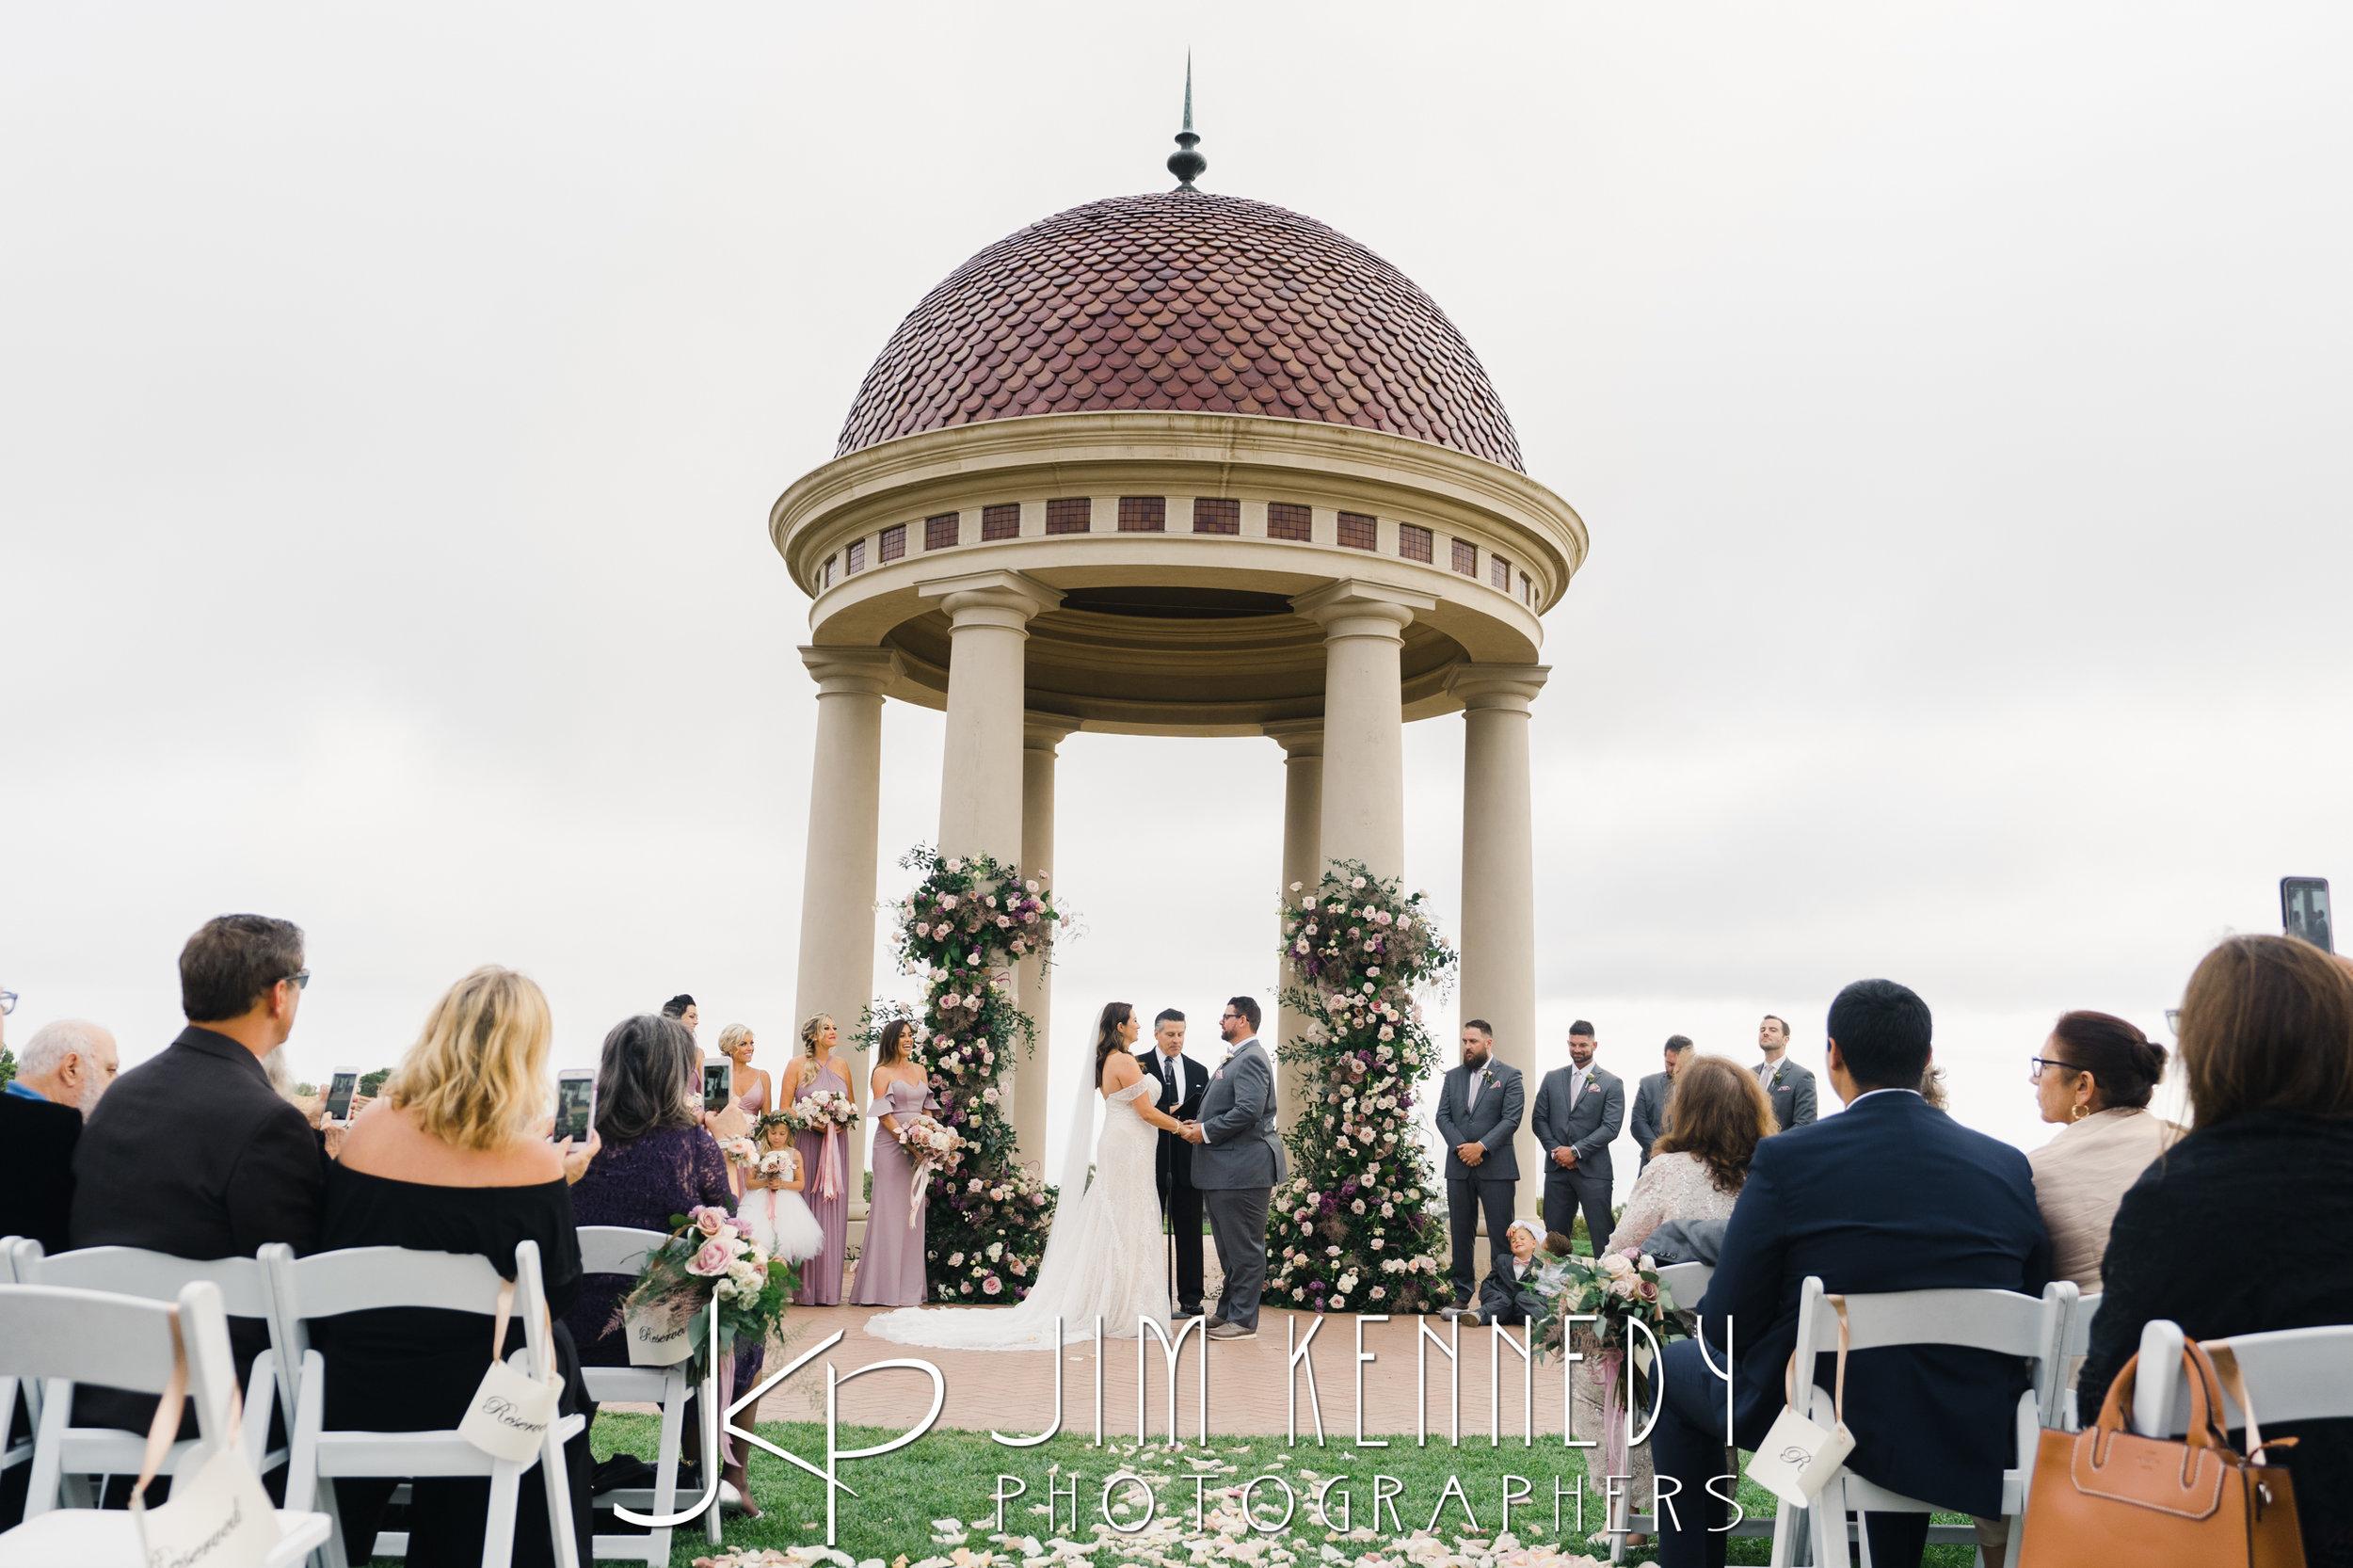 pelican-hill-wedding-jim-kenedy-photographers_0125.JPG